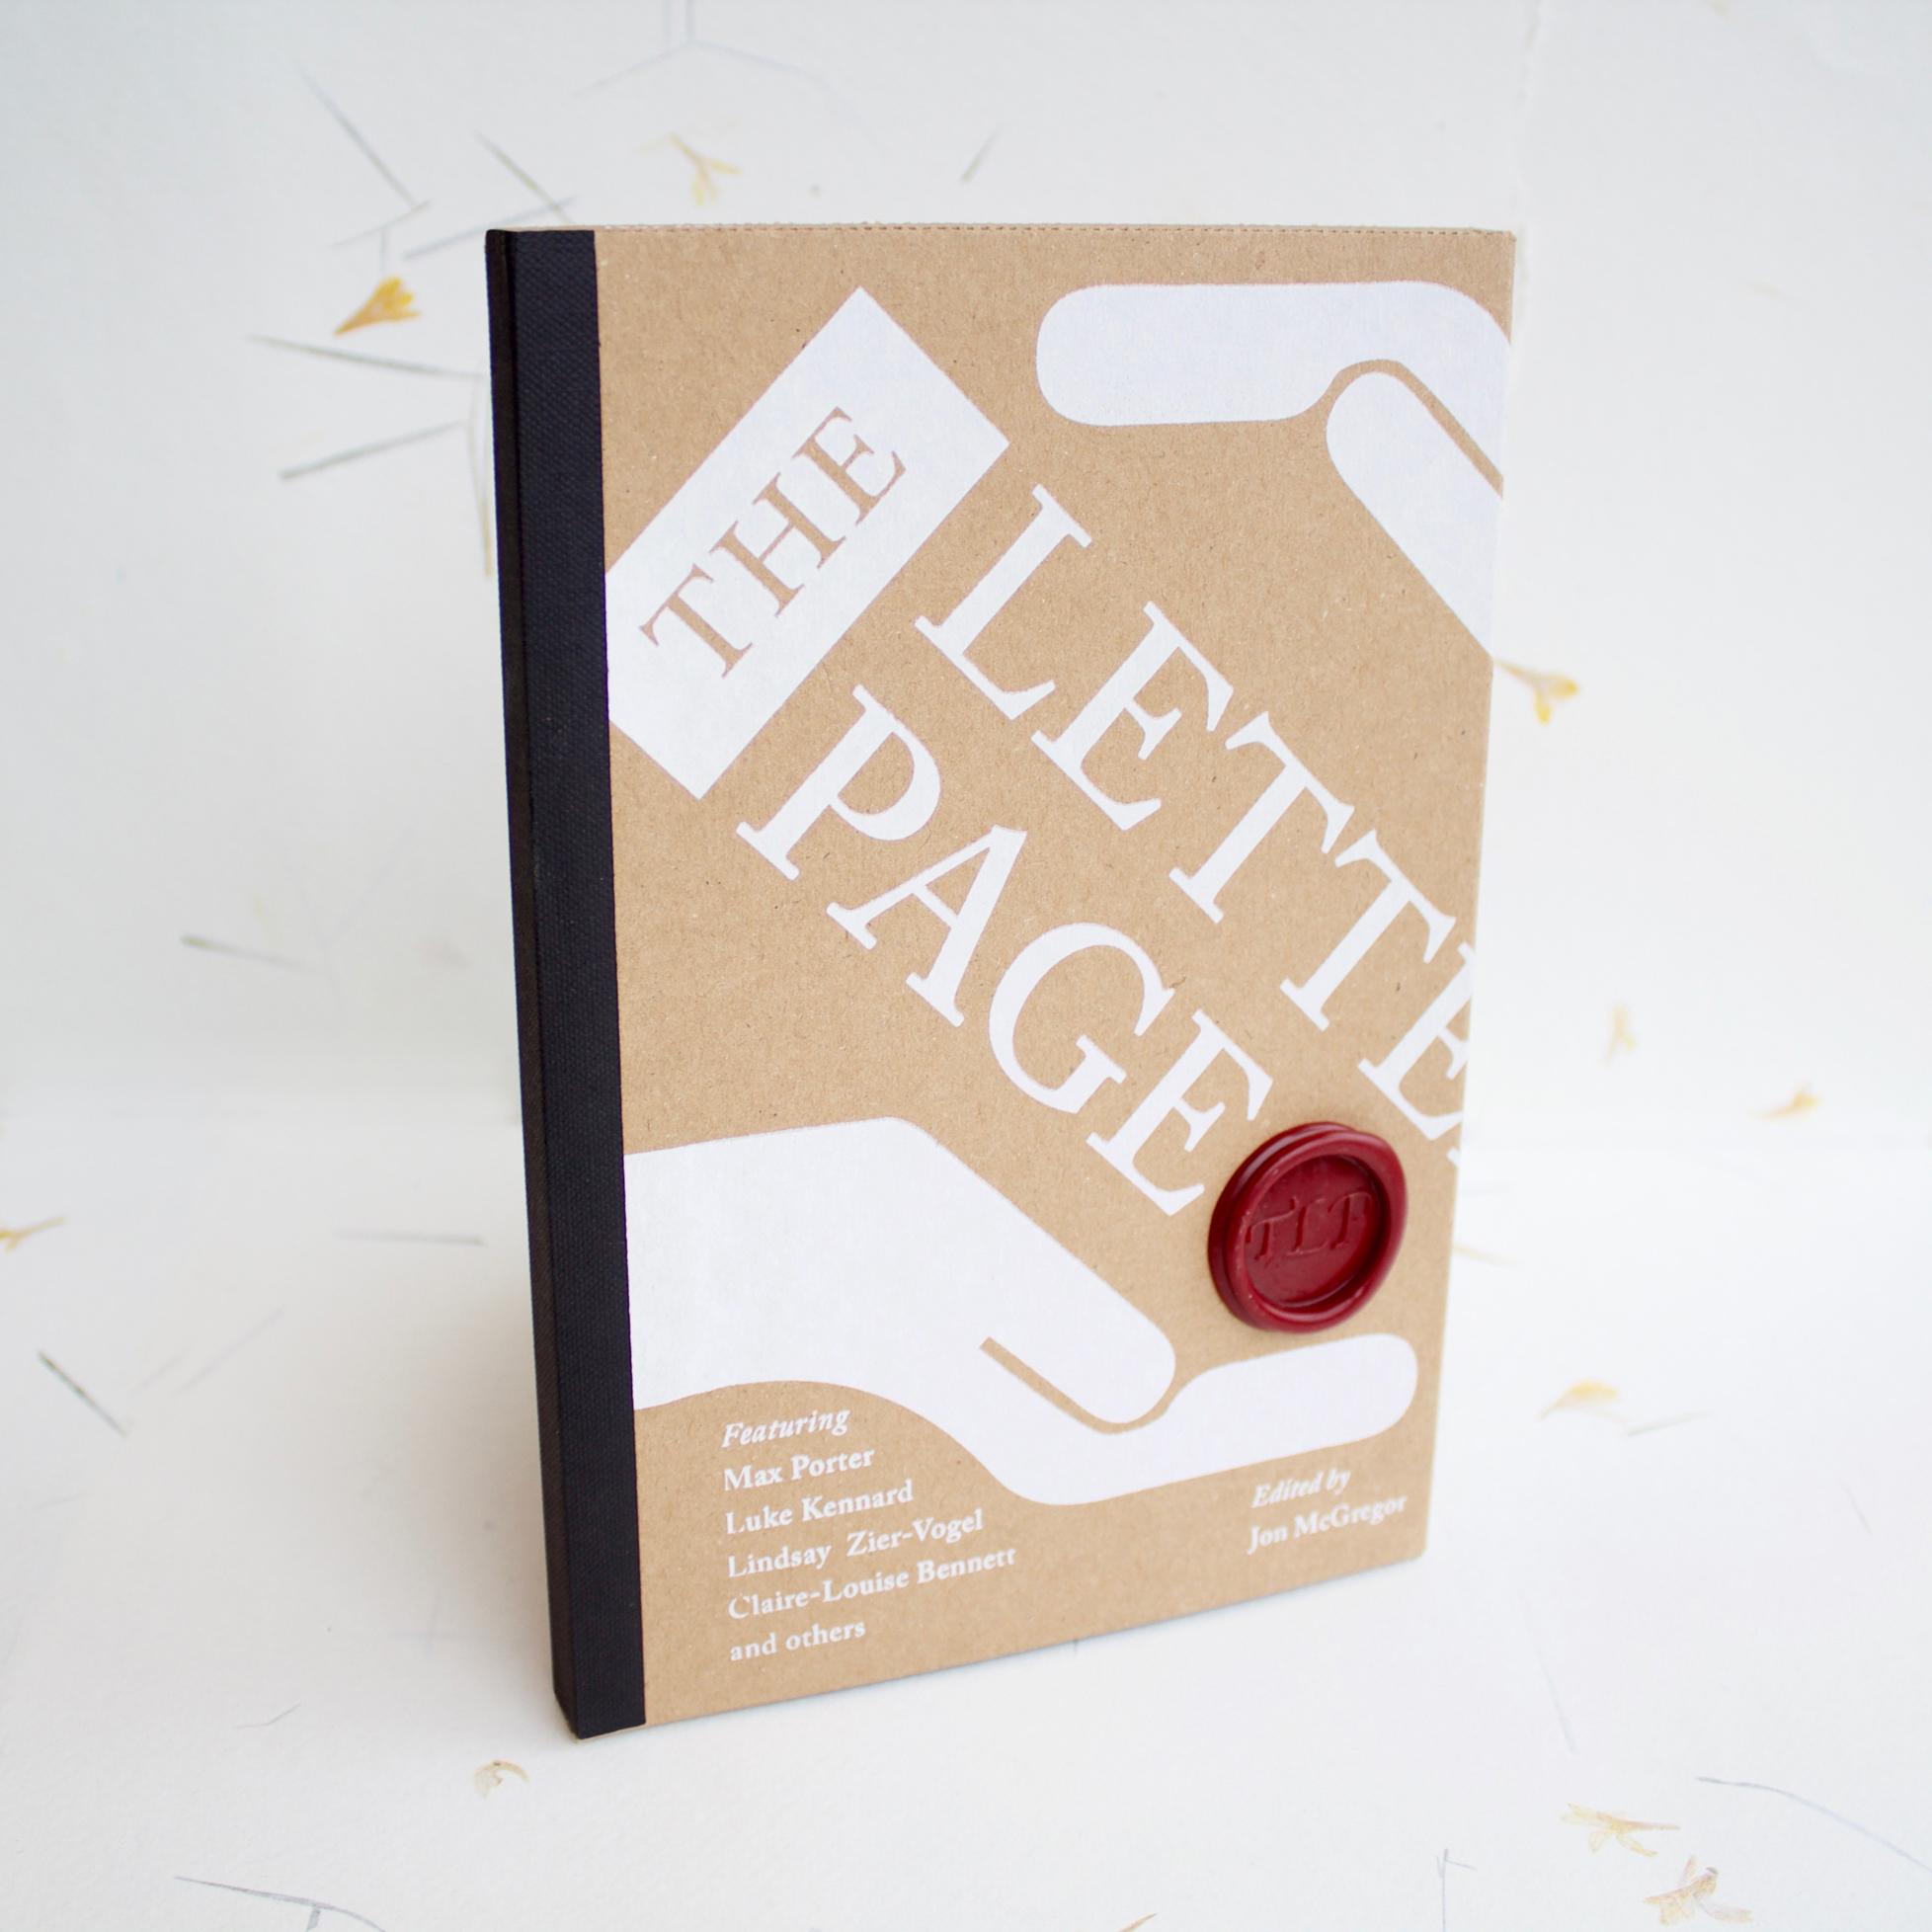 Editorial design - Printing design.jpg